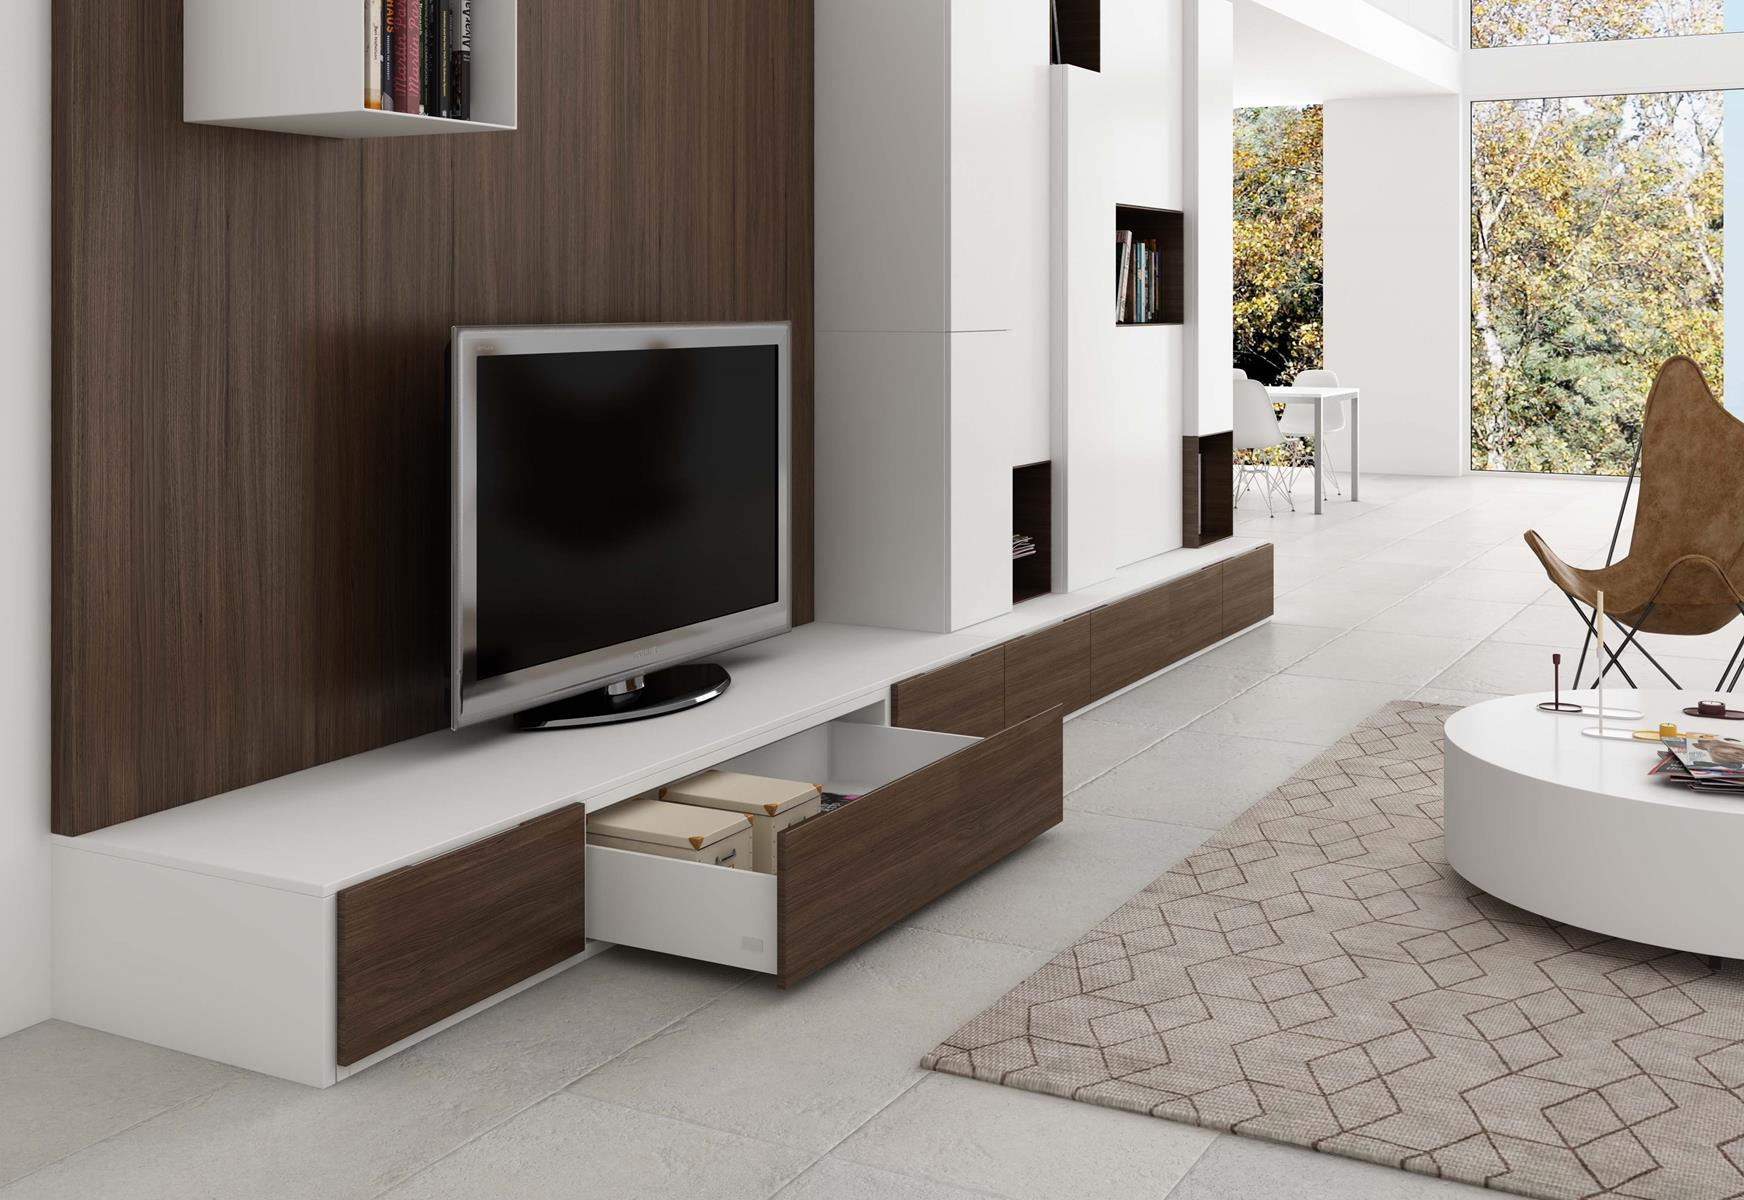 ardis-3d-render-de-mobiliario